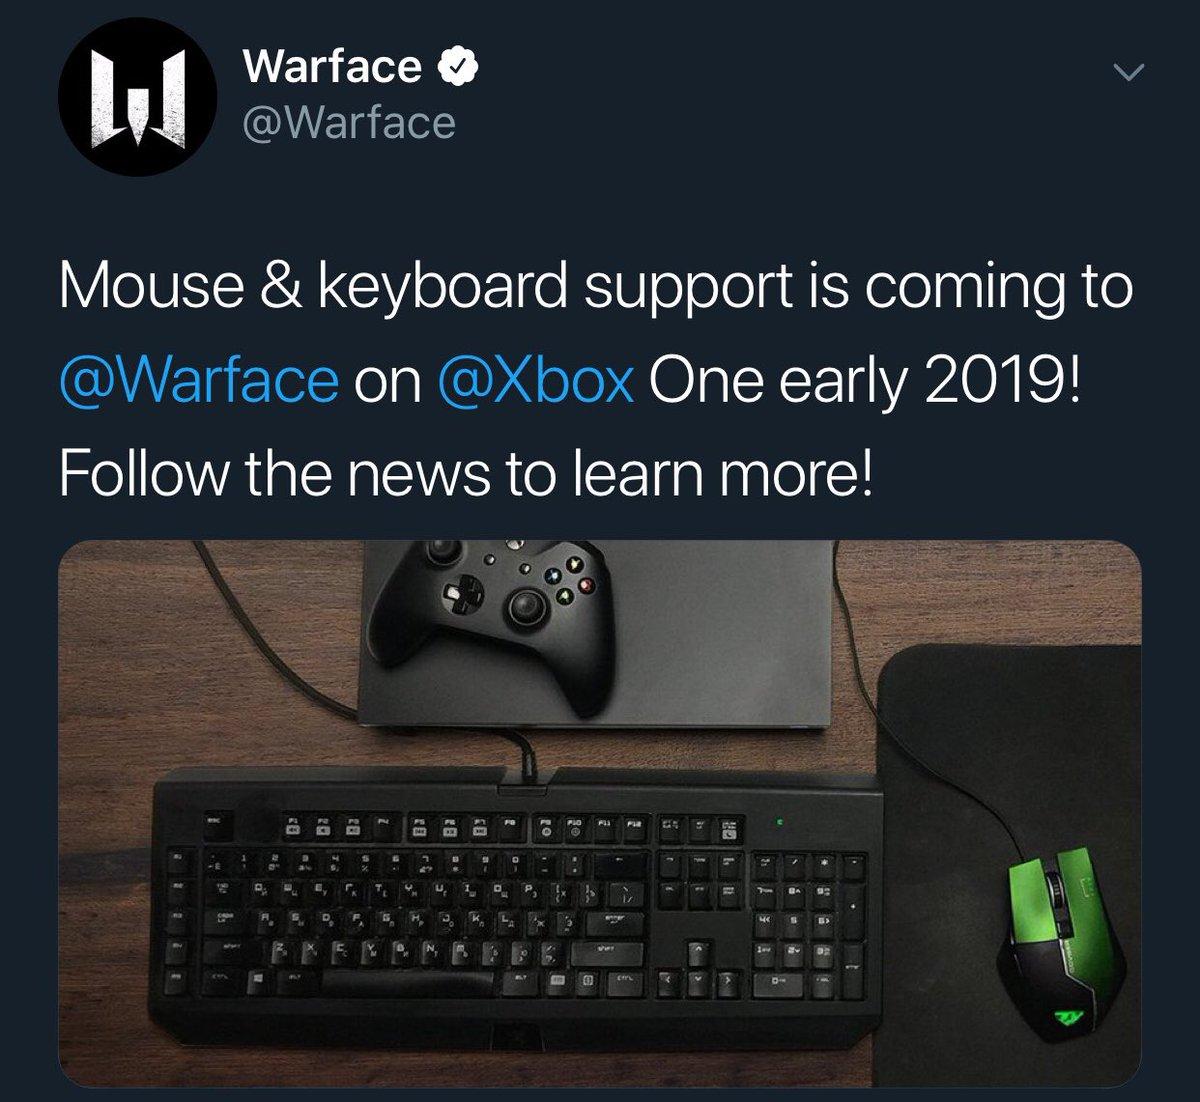 Warface on Twitter: